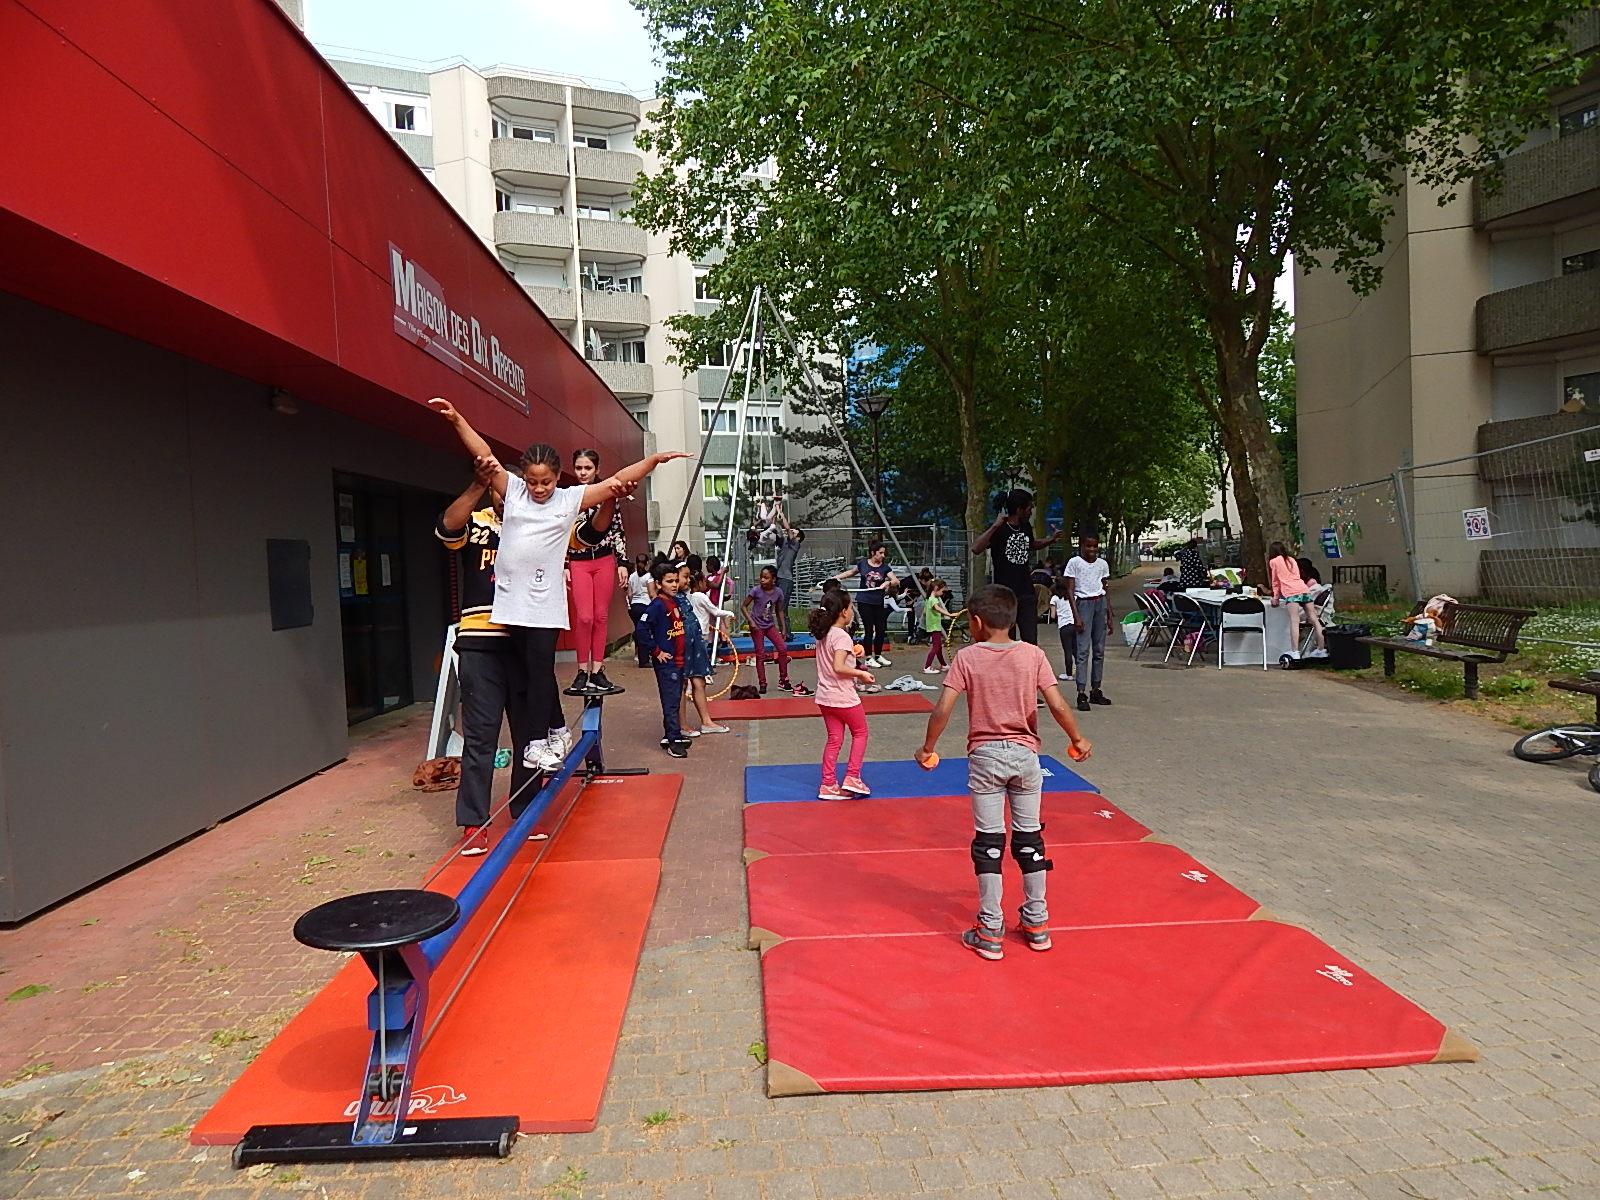 2018.05.23_RAE_Atelier cirque_Eragny (6)